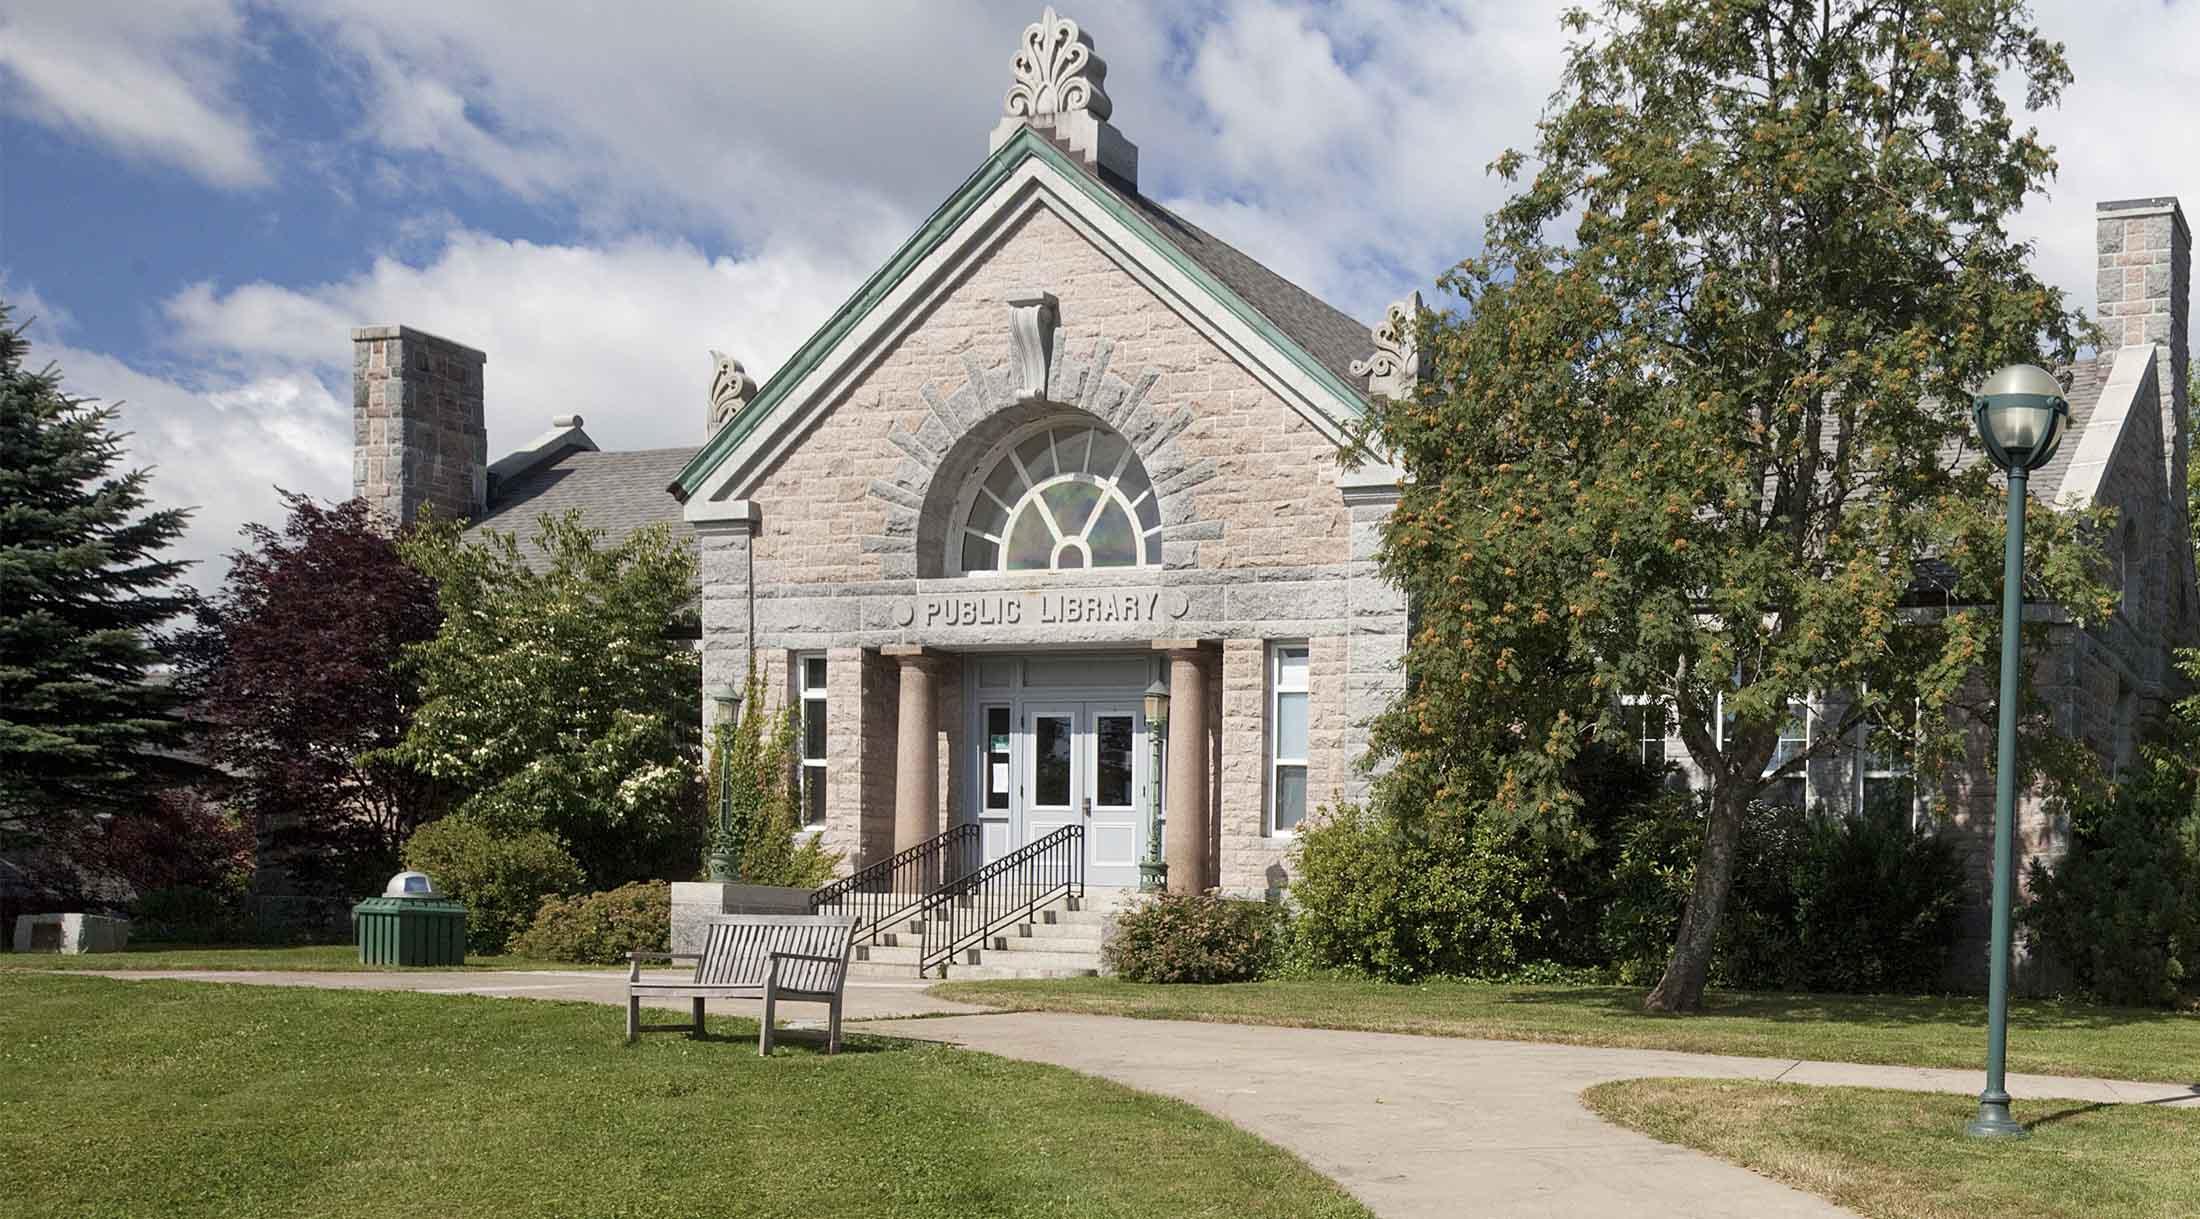 rockland-public-library-by-norman-mcgrath